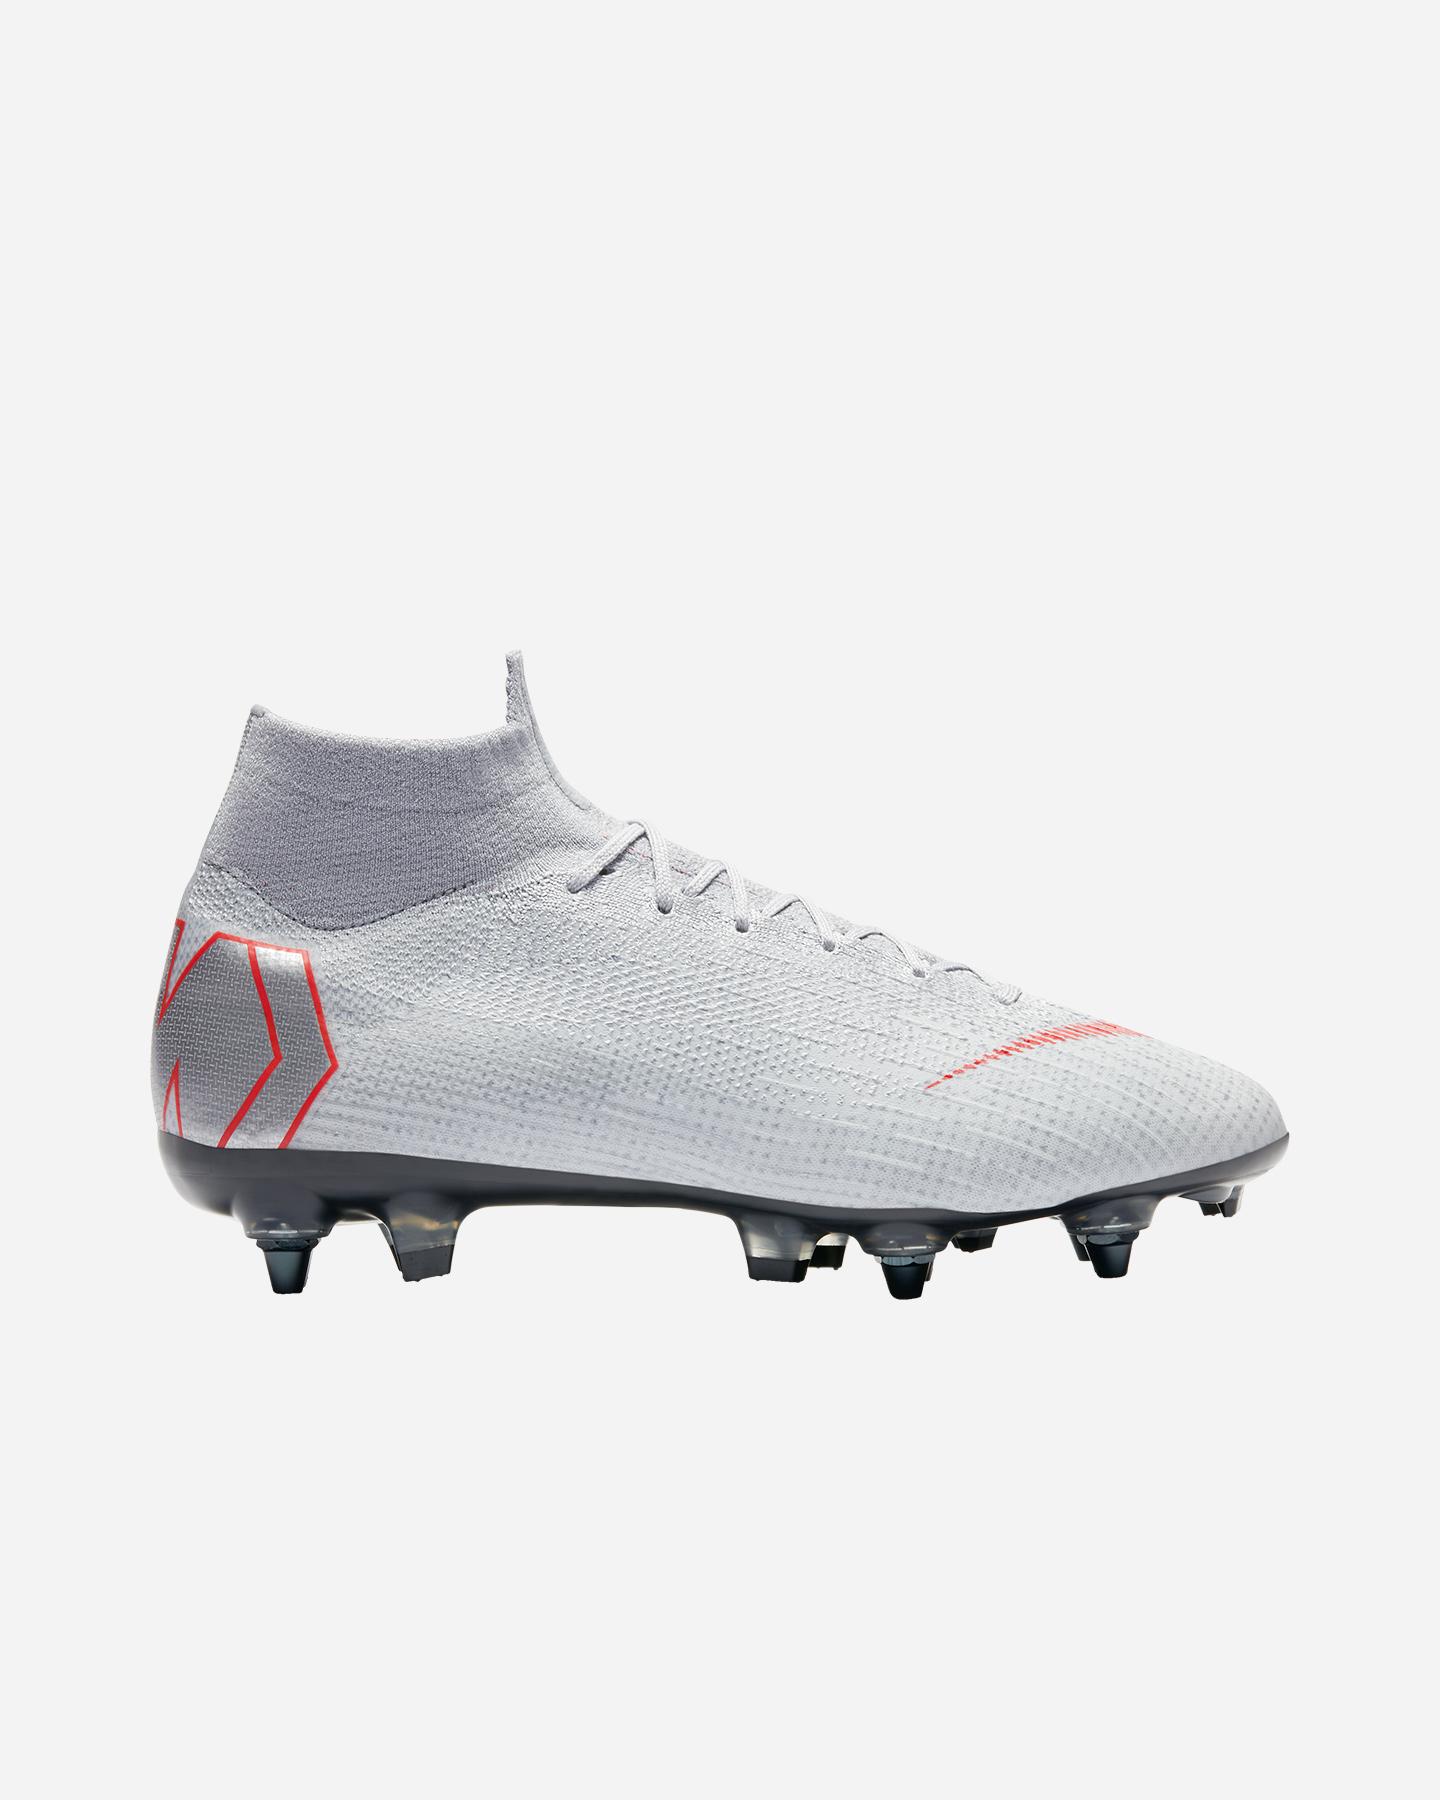 online store f950b 9e8ab Scarpe Calcio Nike Mercurial Superfly 360 Elite Sg-pro M AH7366-060 ...